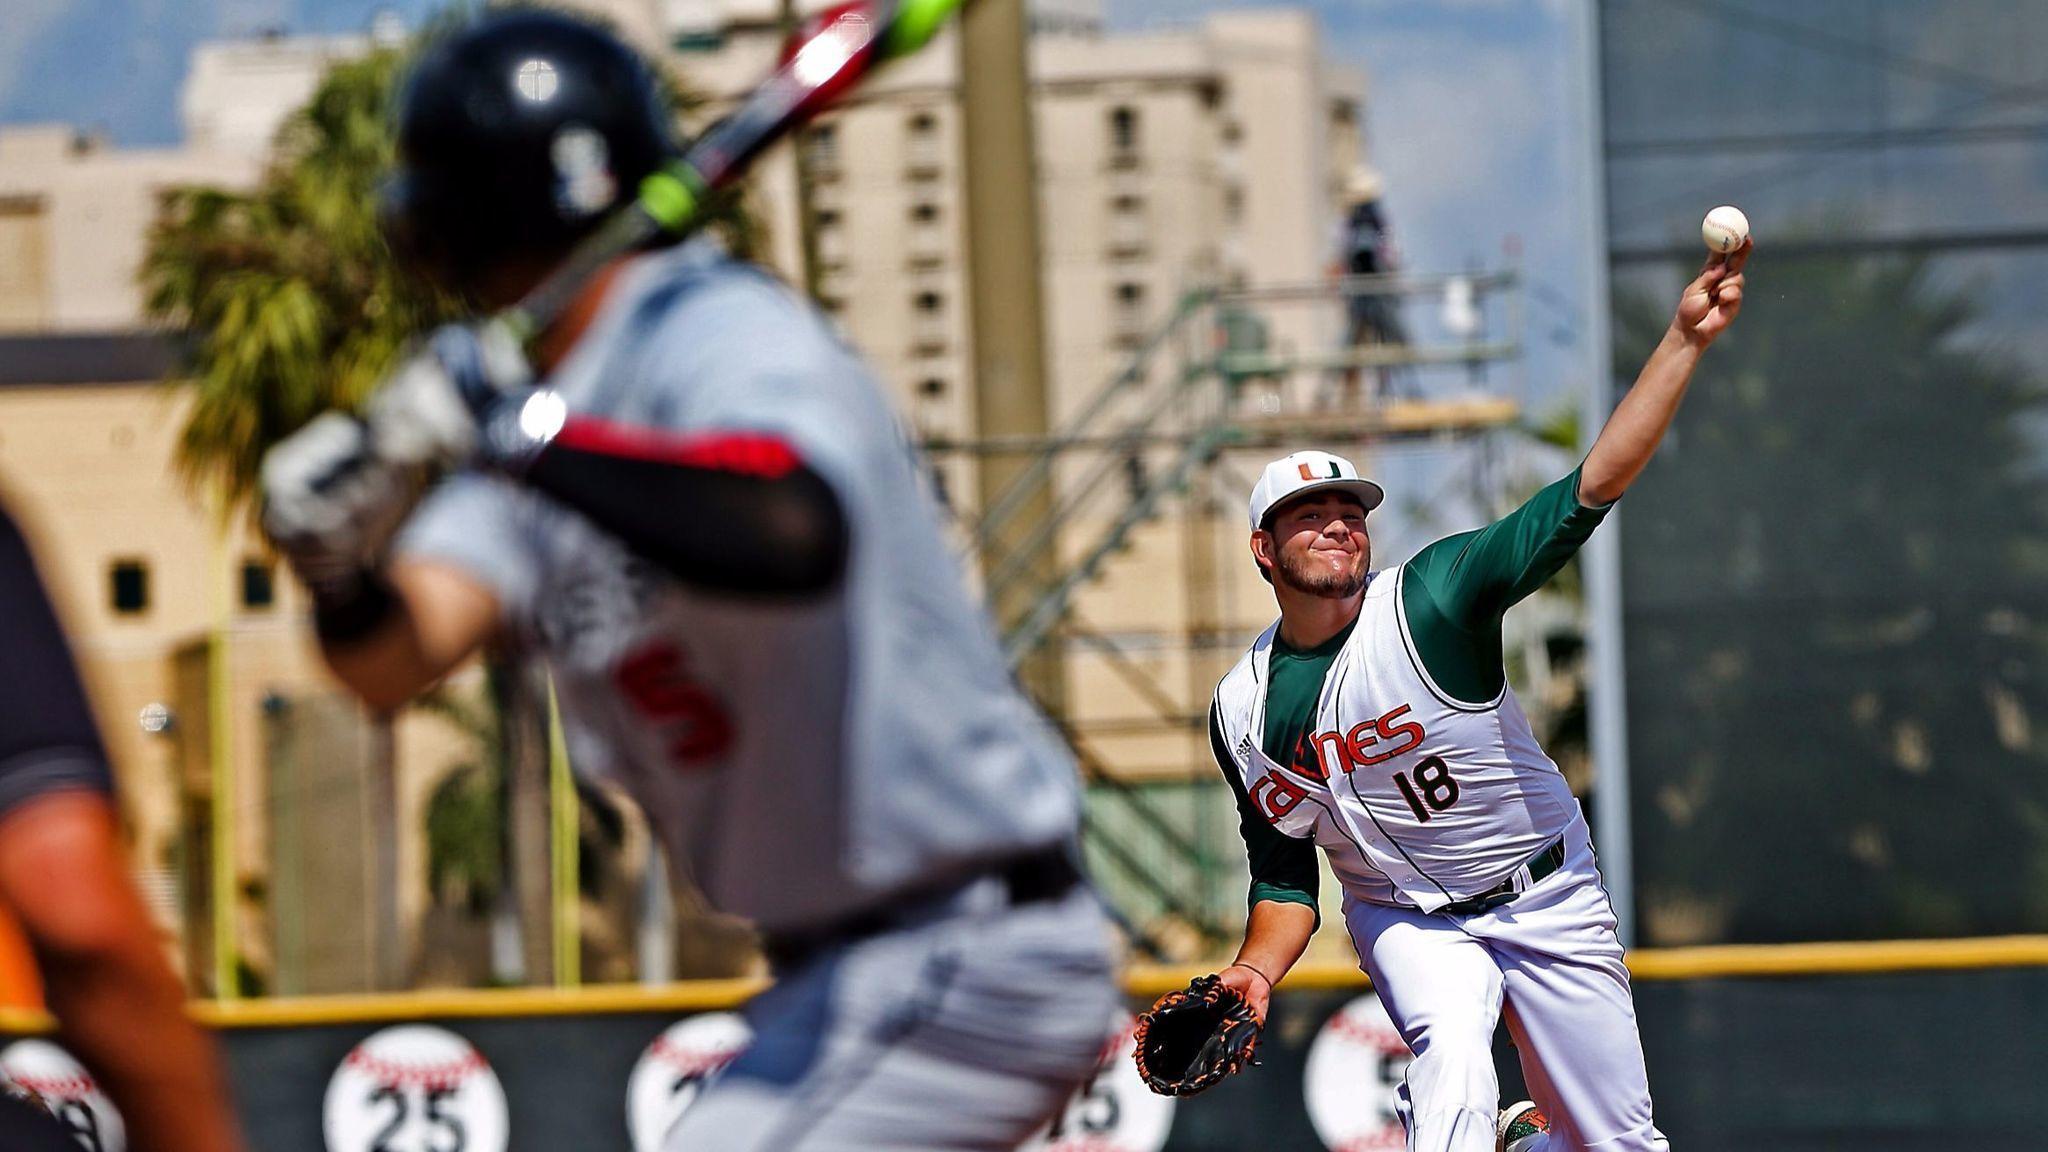 Fl-sp-um-baseball-0220